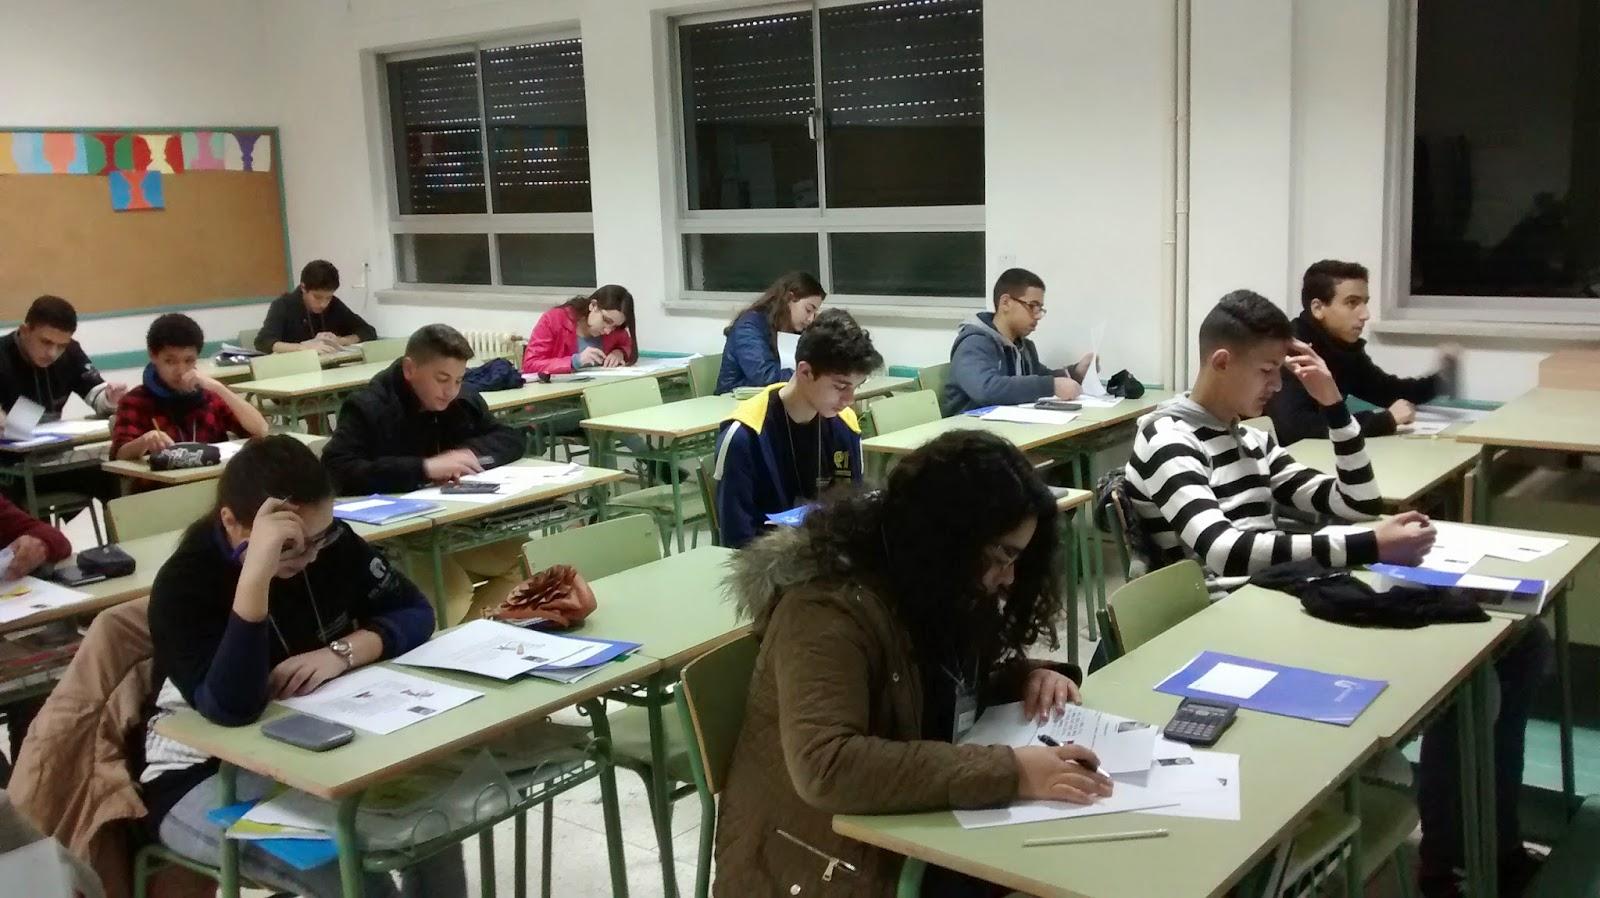 Ie melchor de jovellanos alhucemas aaee xviii for Educacion exterior marruecos